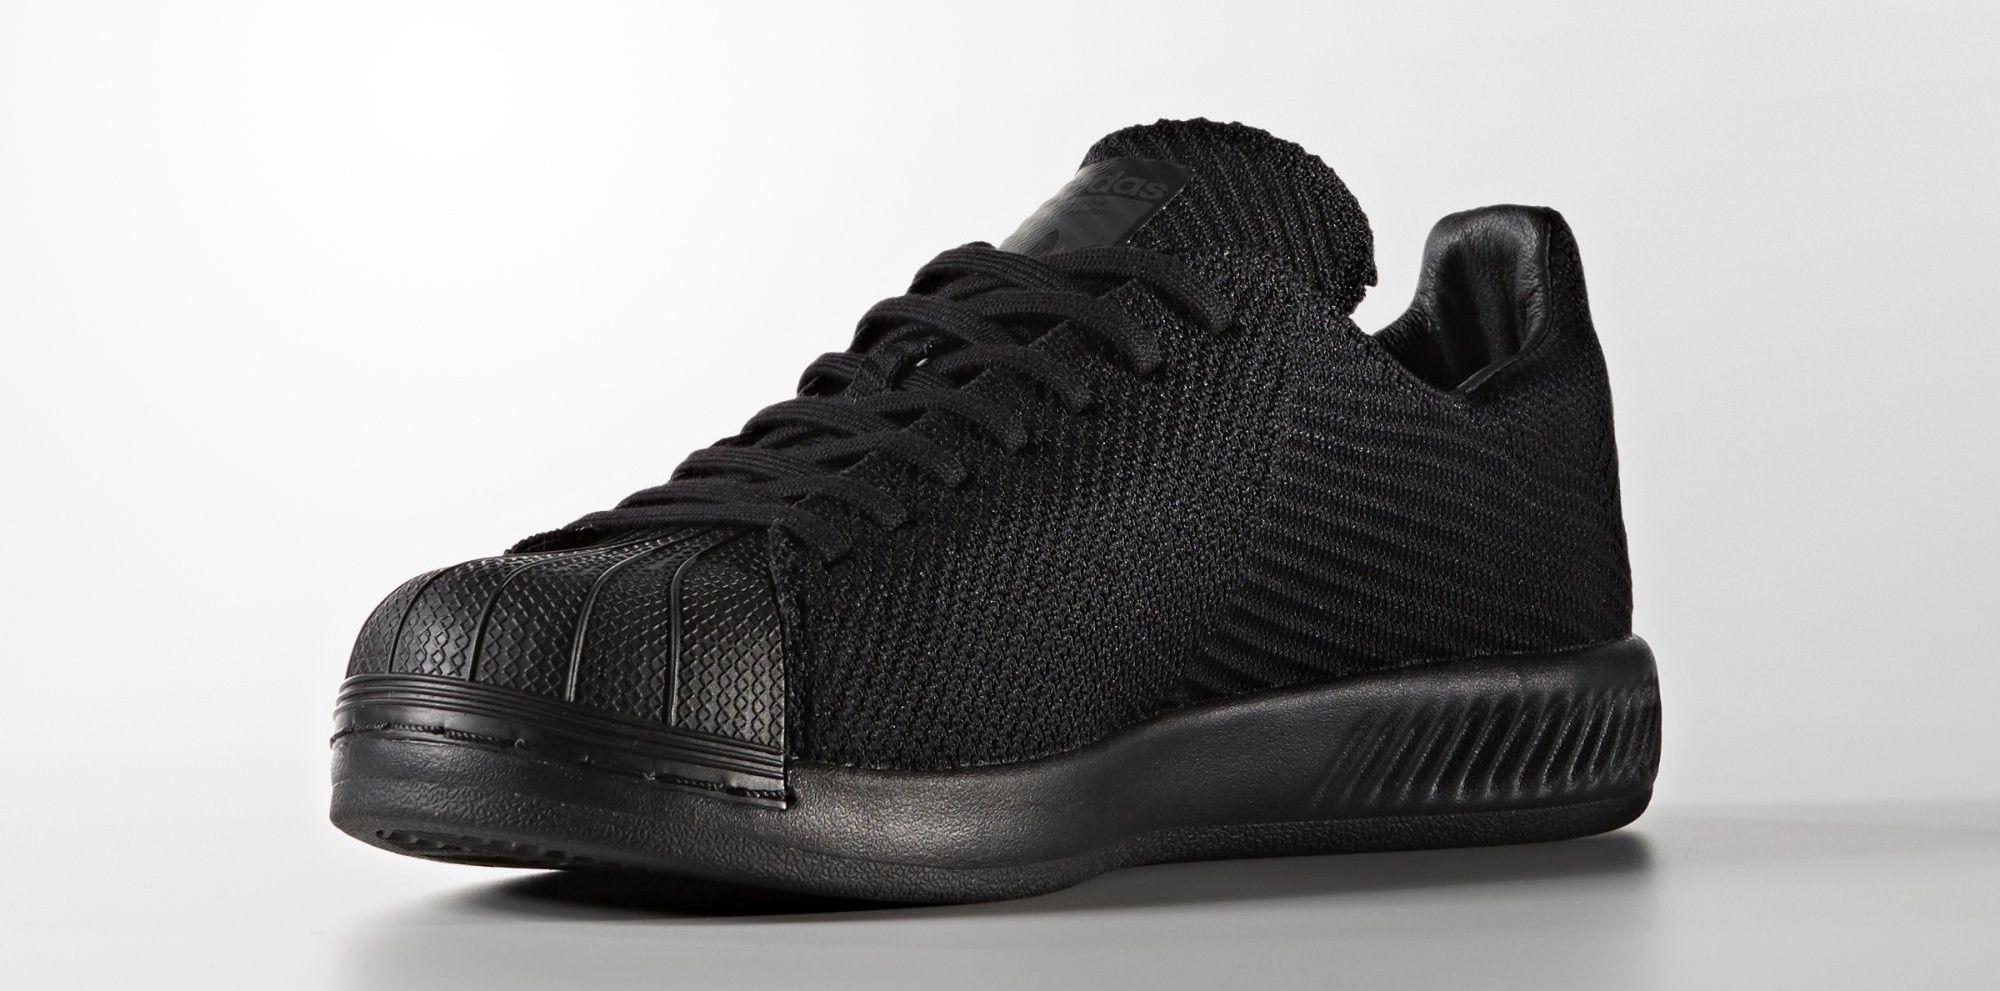 adidas Superstar Bounce PK 8